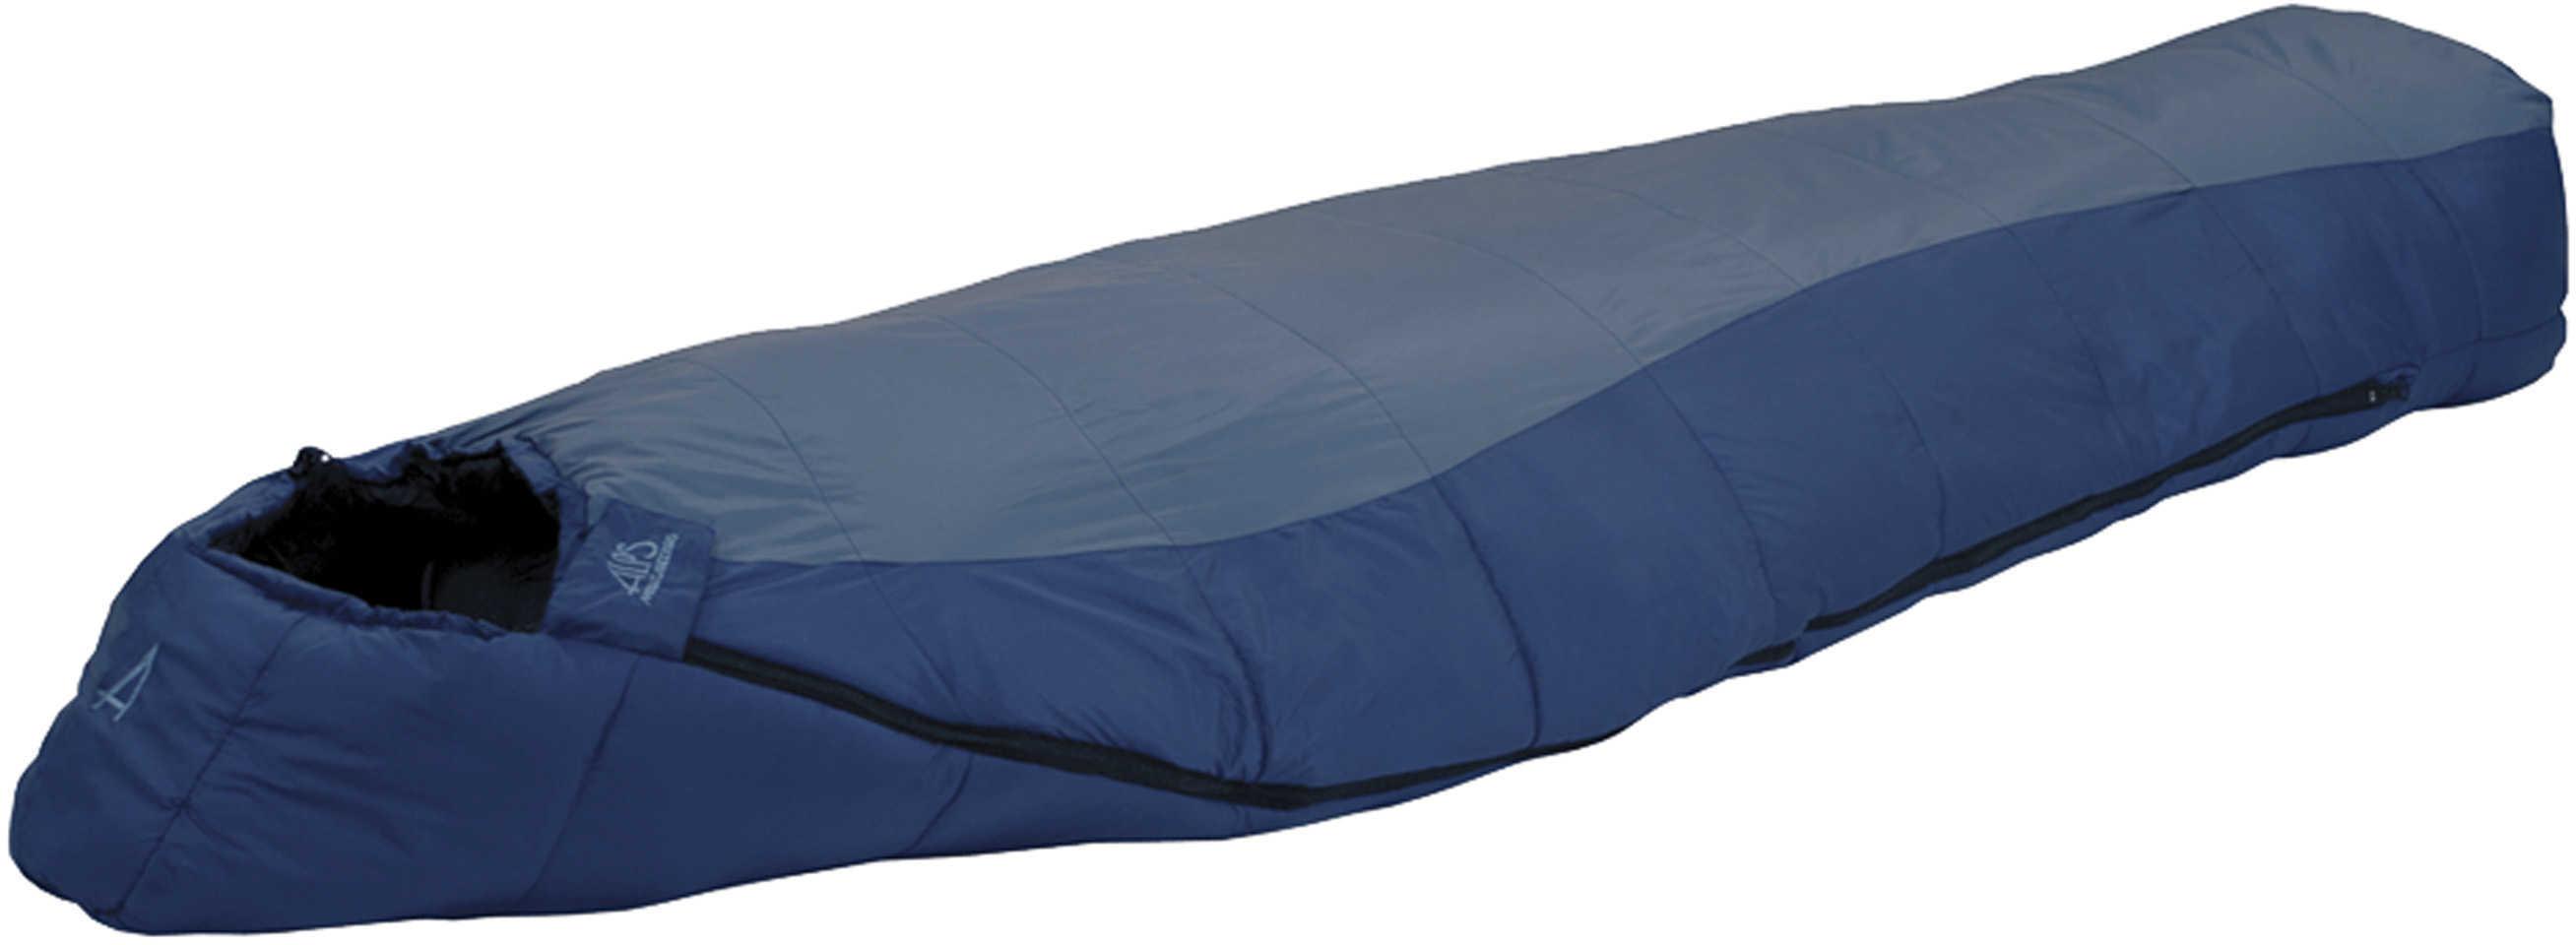 Blue Springs Blue/Navy Sleeping Bag +35° Regular Md: 4701732